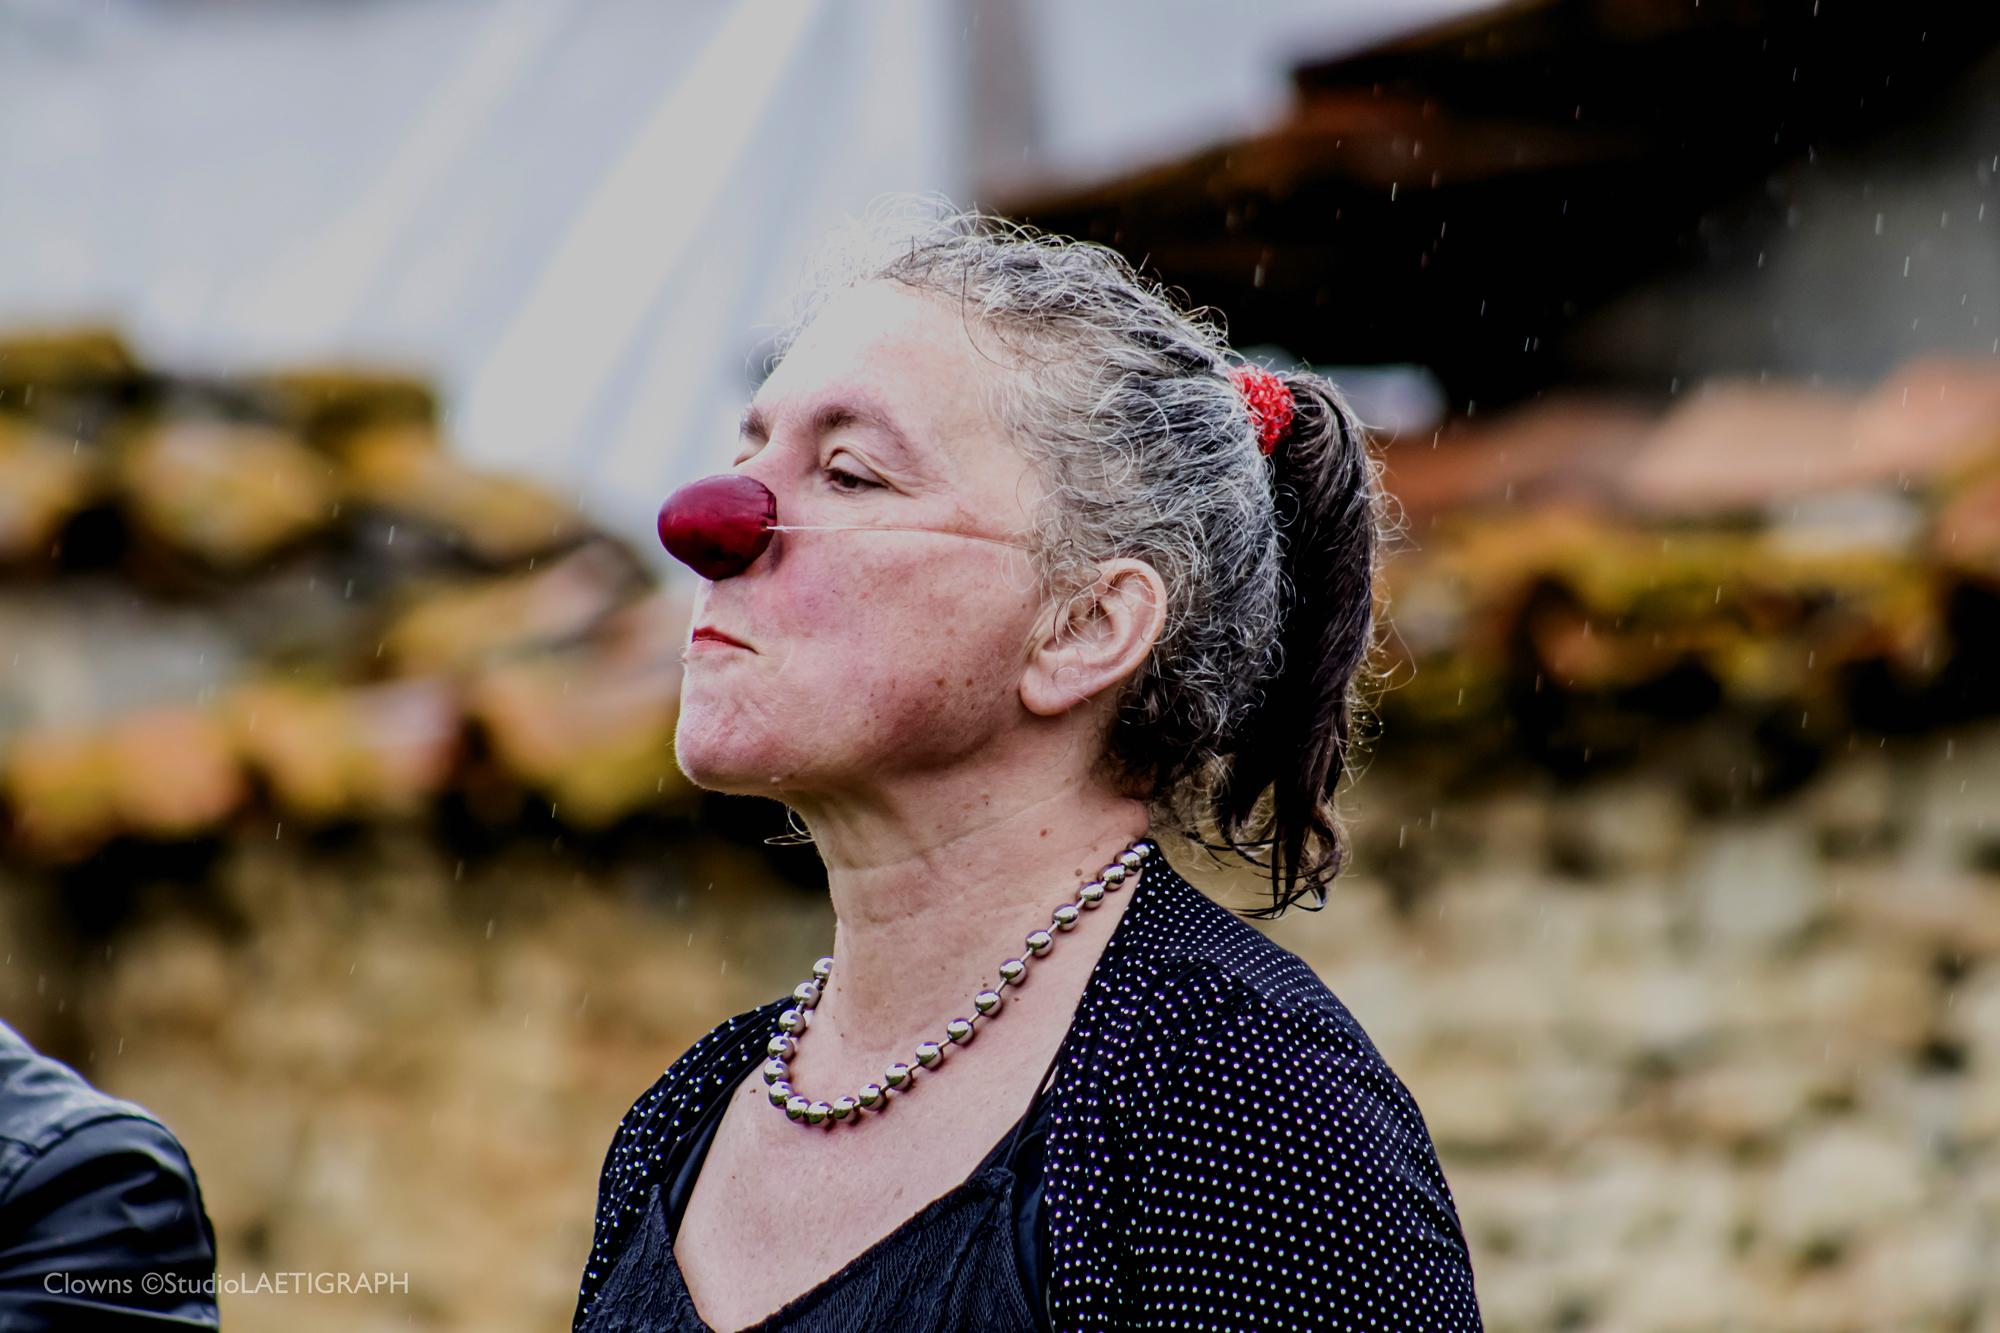 LMDCB21_clowns-75_1